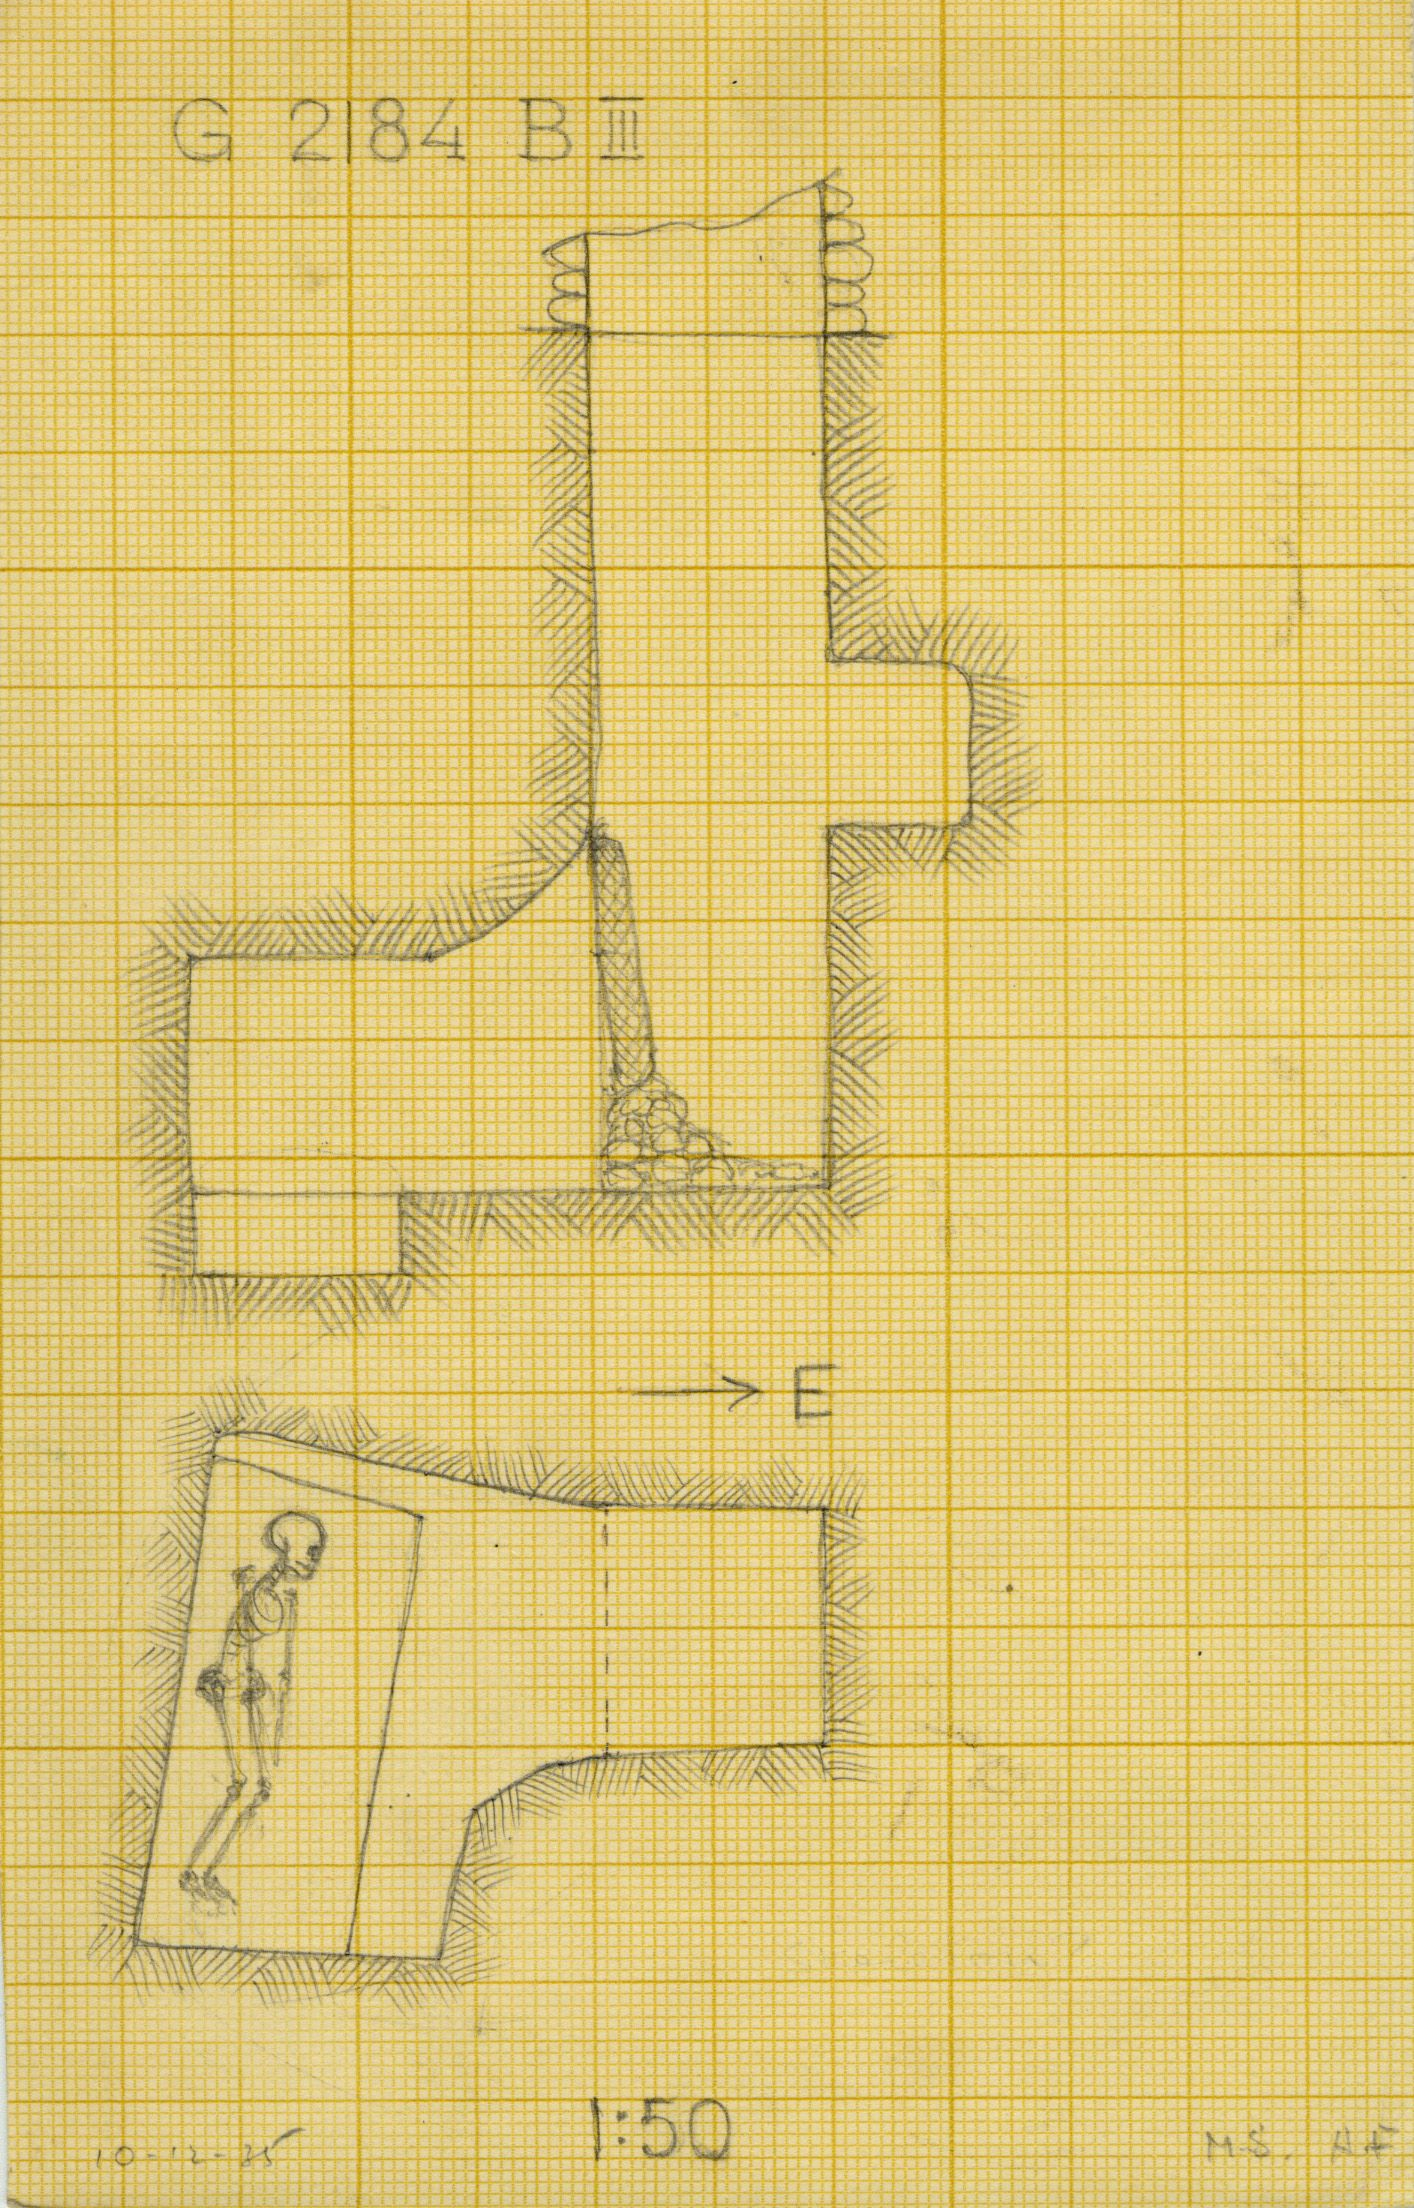 Maps and plans: G 2184, Shaft B (III)